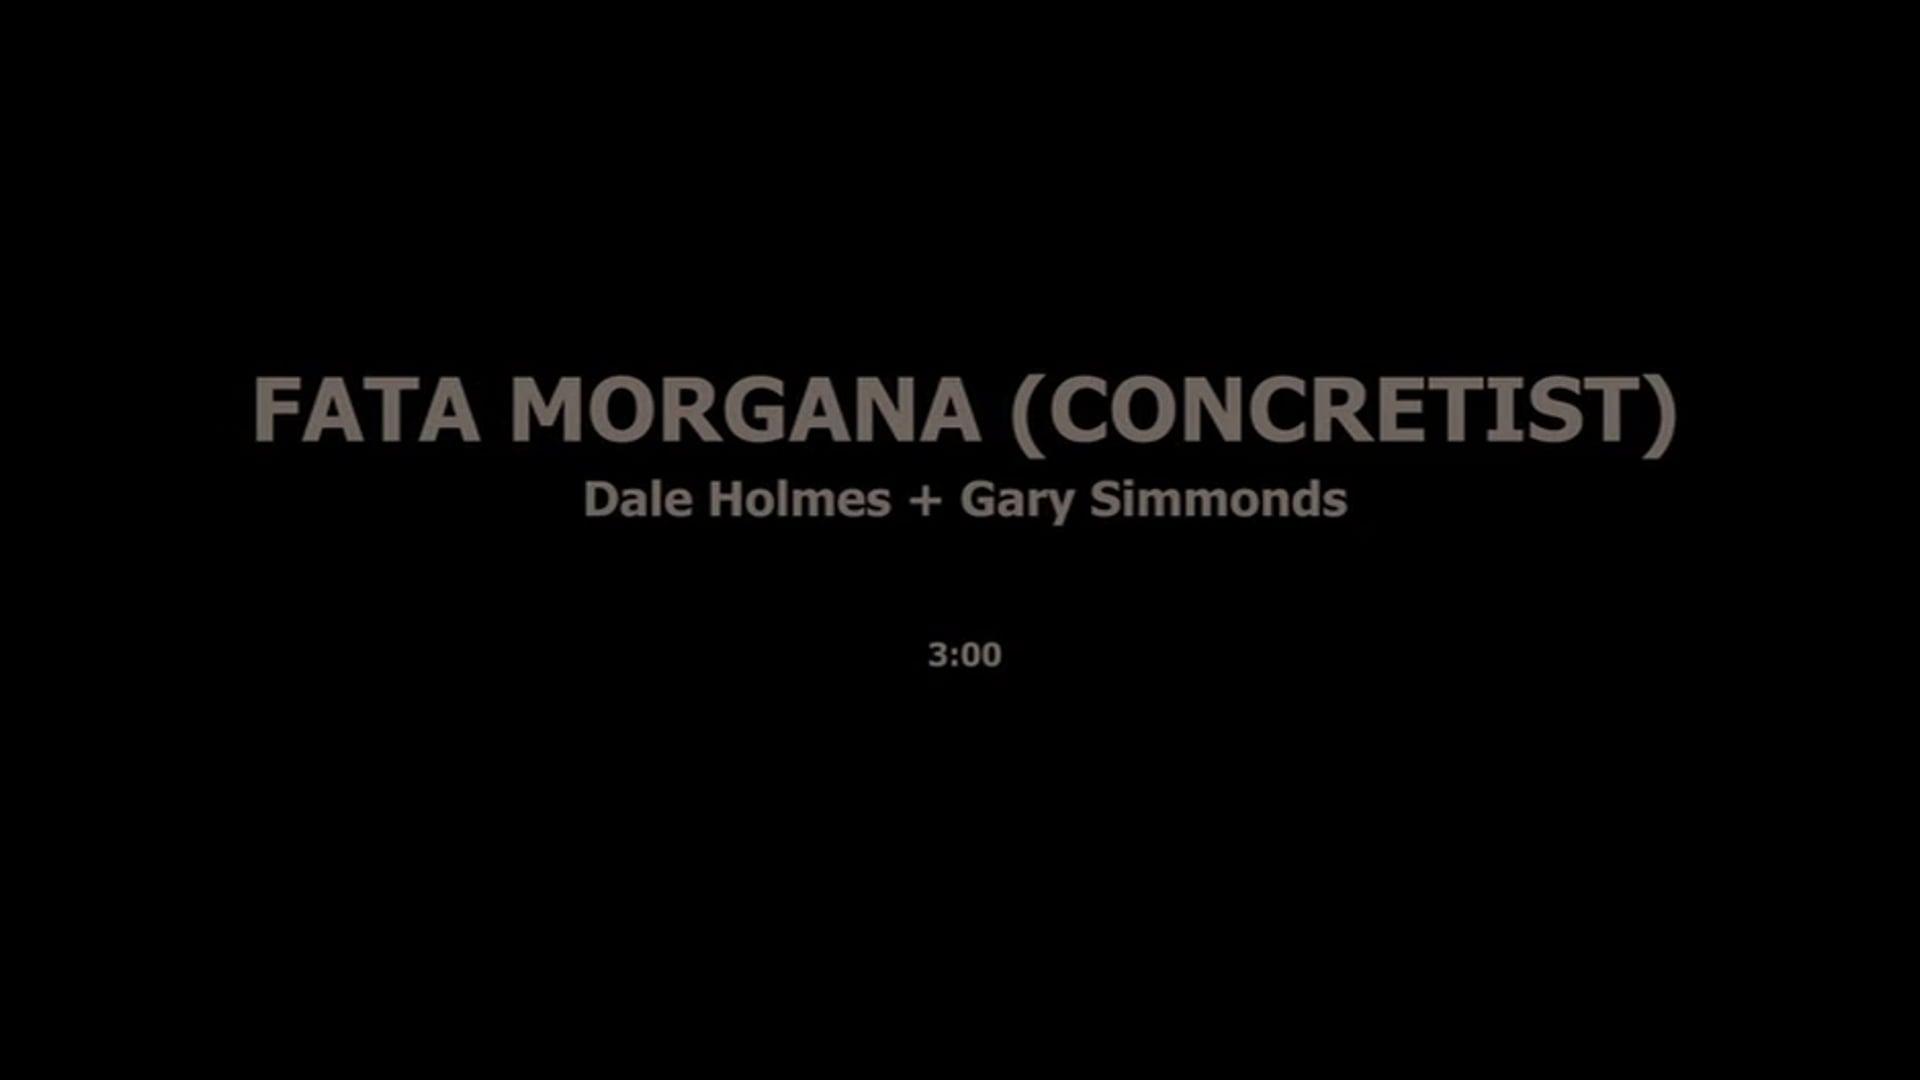 FATA MORGANA (CONCRETIST) - DALE HOLMES, GARY SIMMONDS